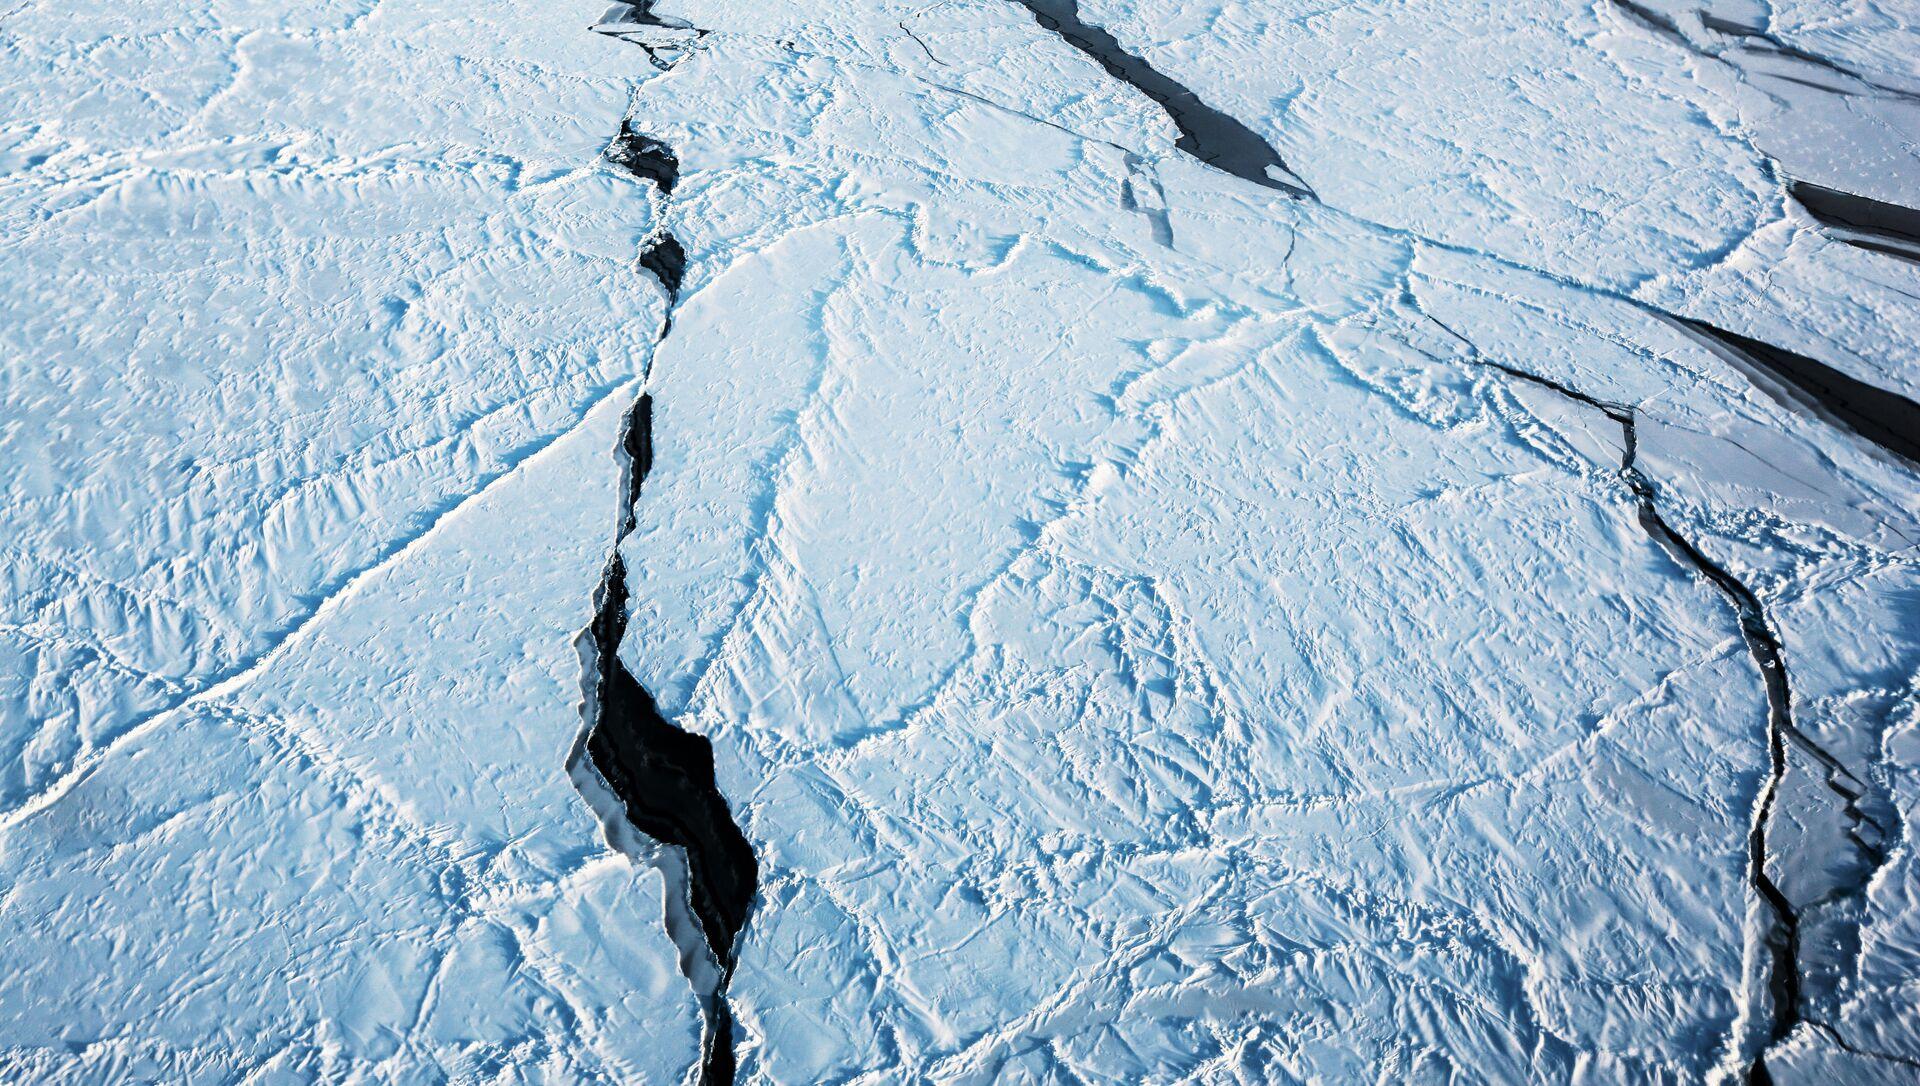 Mar Glaciale Artico  - Sputnik Italia, 1920, 28.02.2021